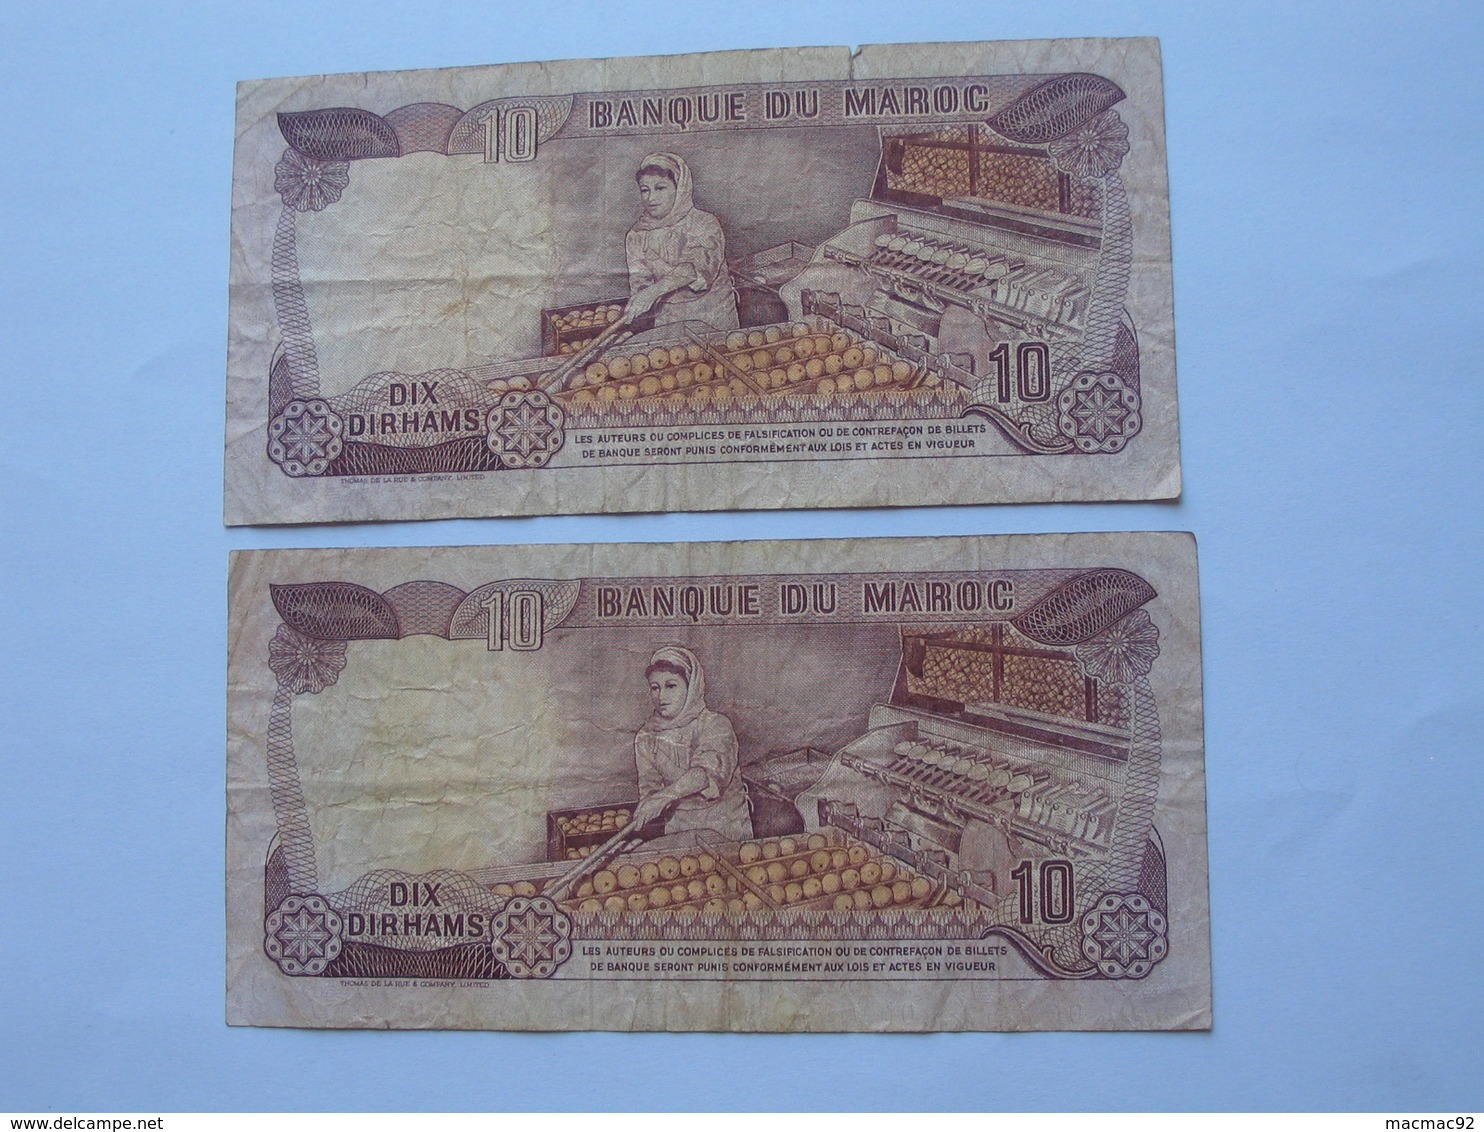 Lot De 2 Billets - 10 Dirhams 1970-1390 Maroc - Banque Du Maroc  **** EN ACHAT IMMEDIAT **** - Maroc